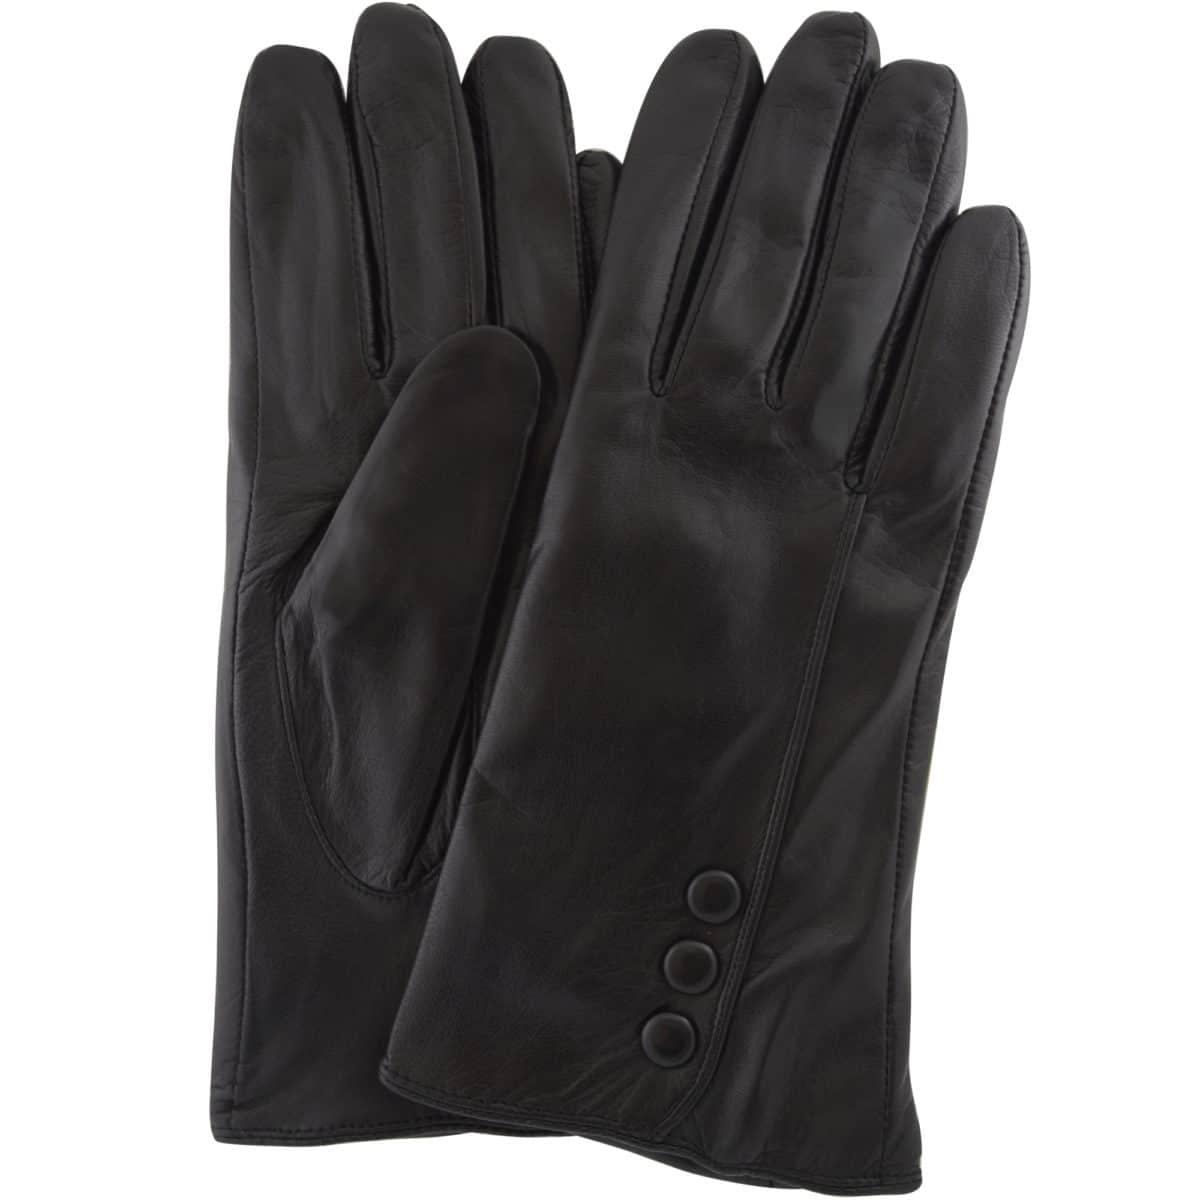 Rhian - Leather Gloves Triple Button Feature - Black